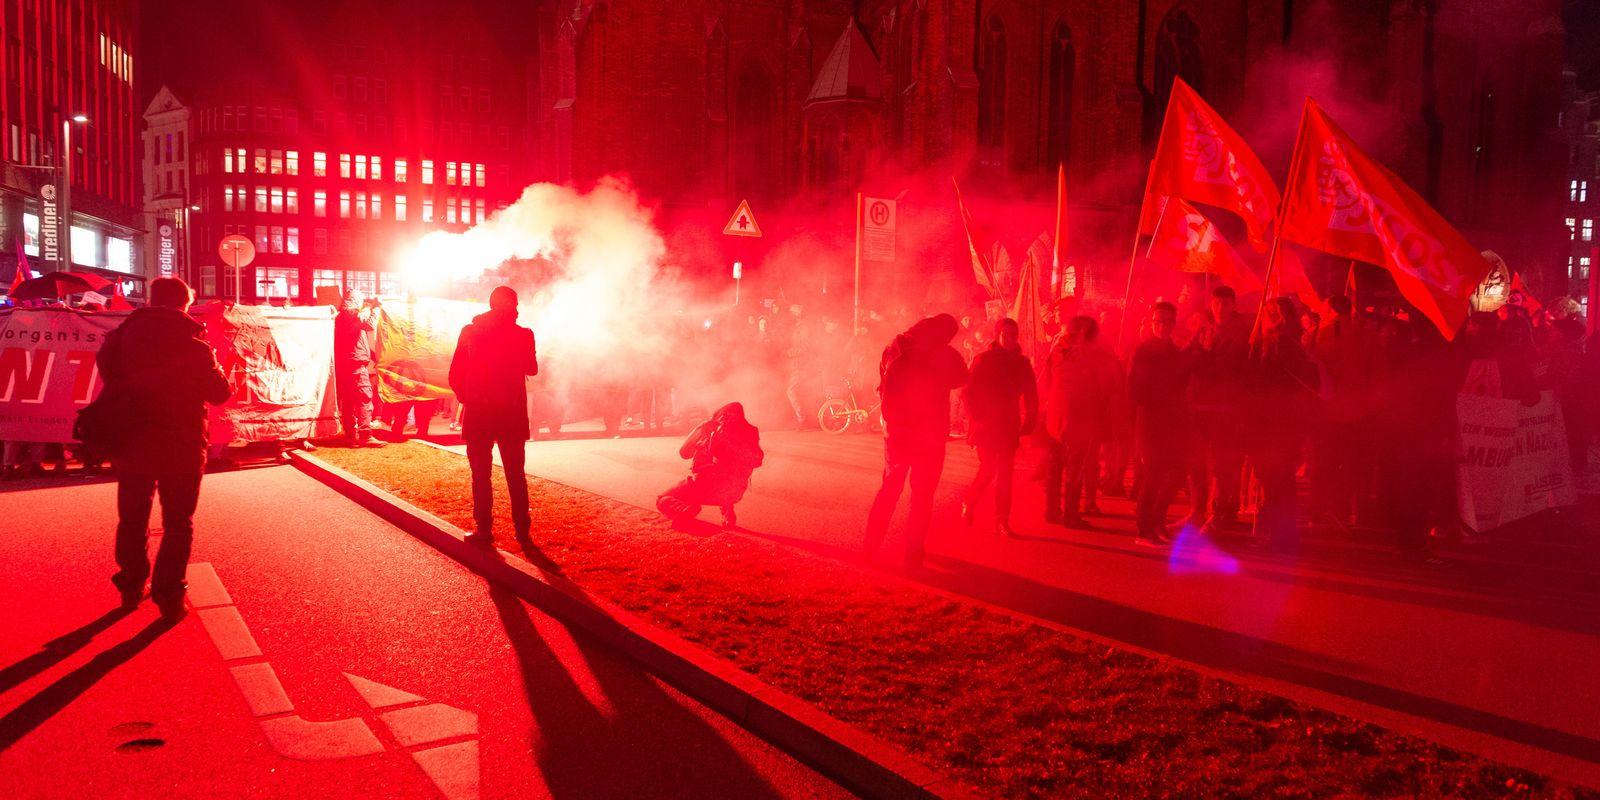 Ministerpräsidentenwahl Thüringen - Proteste